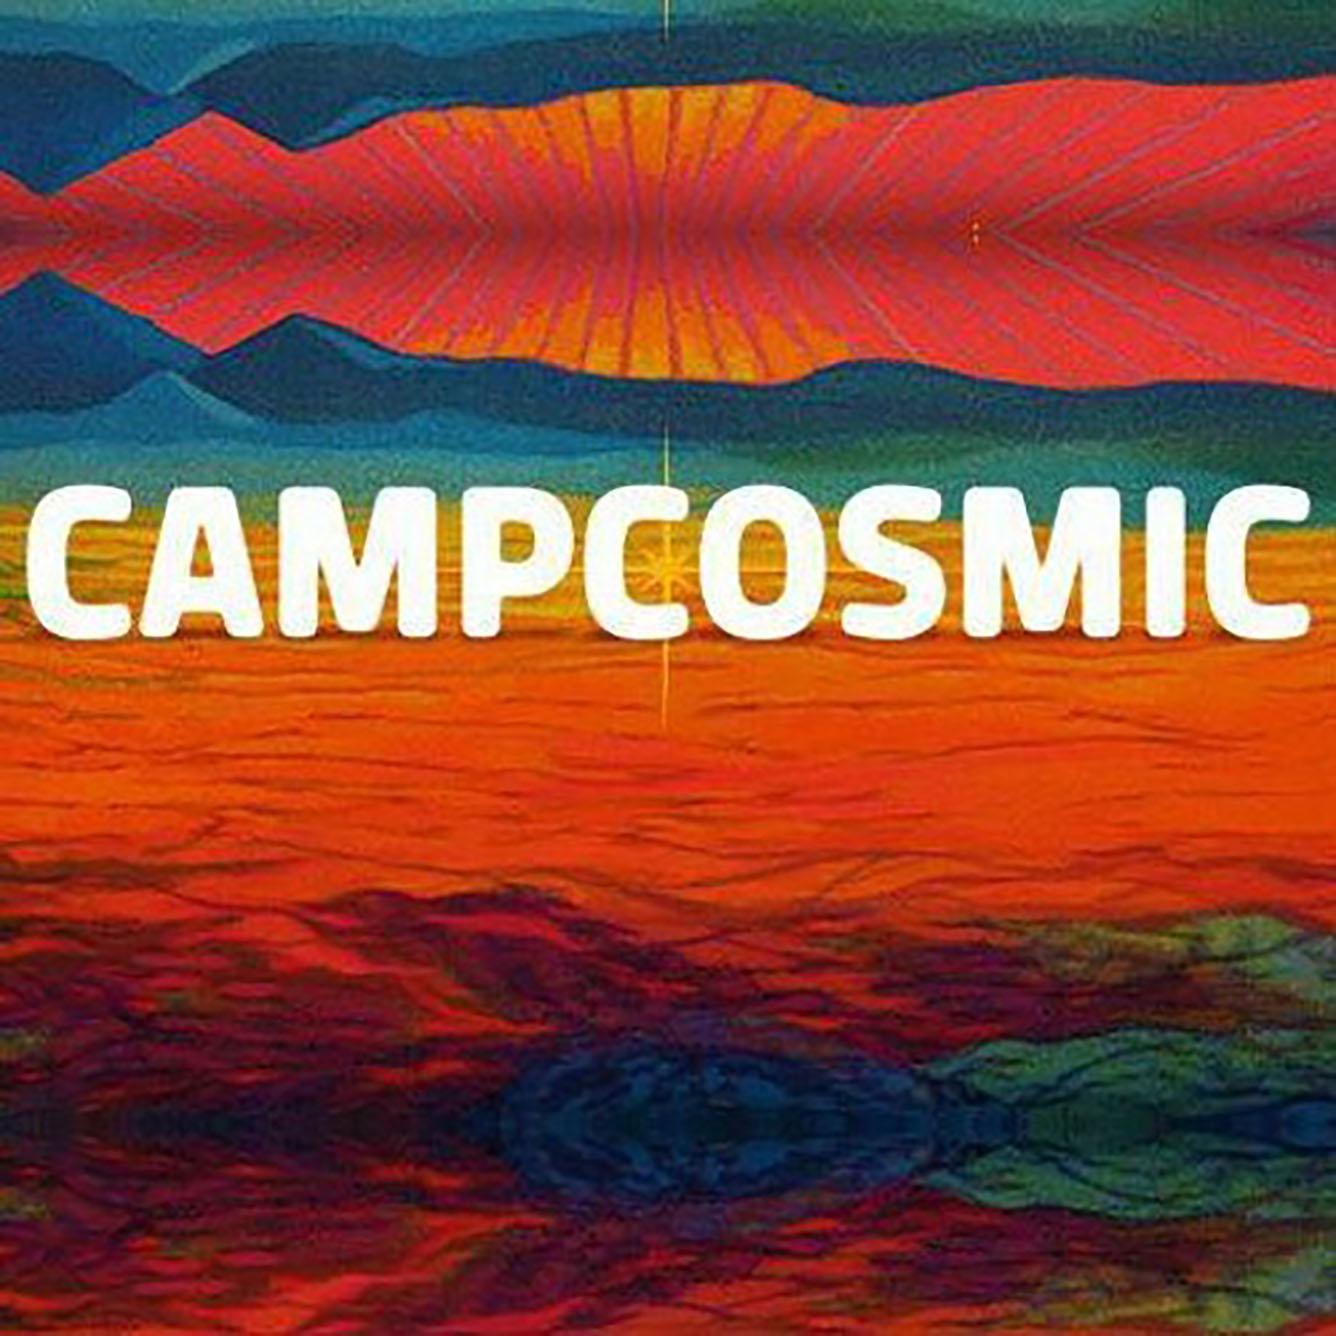 Behind the Amusement Park – Camp Cosmic 2015